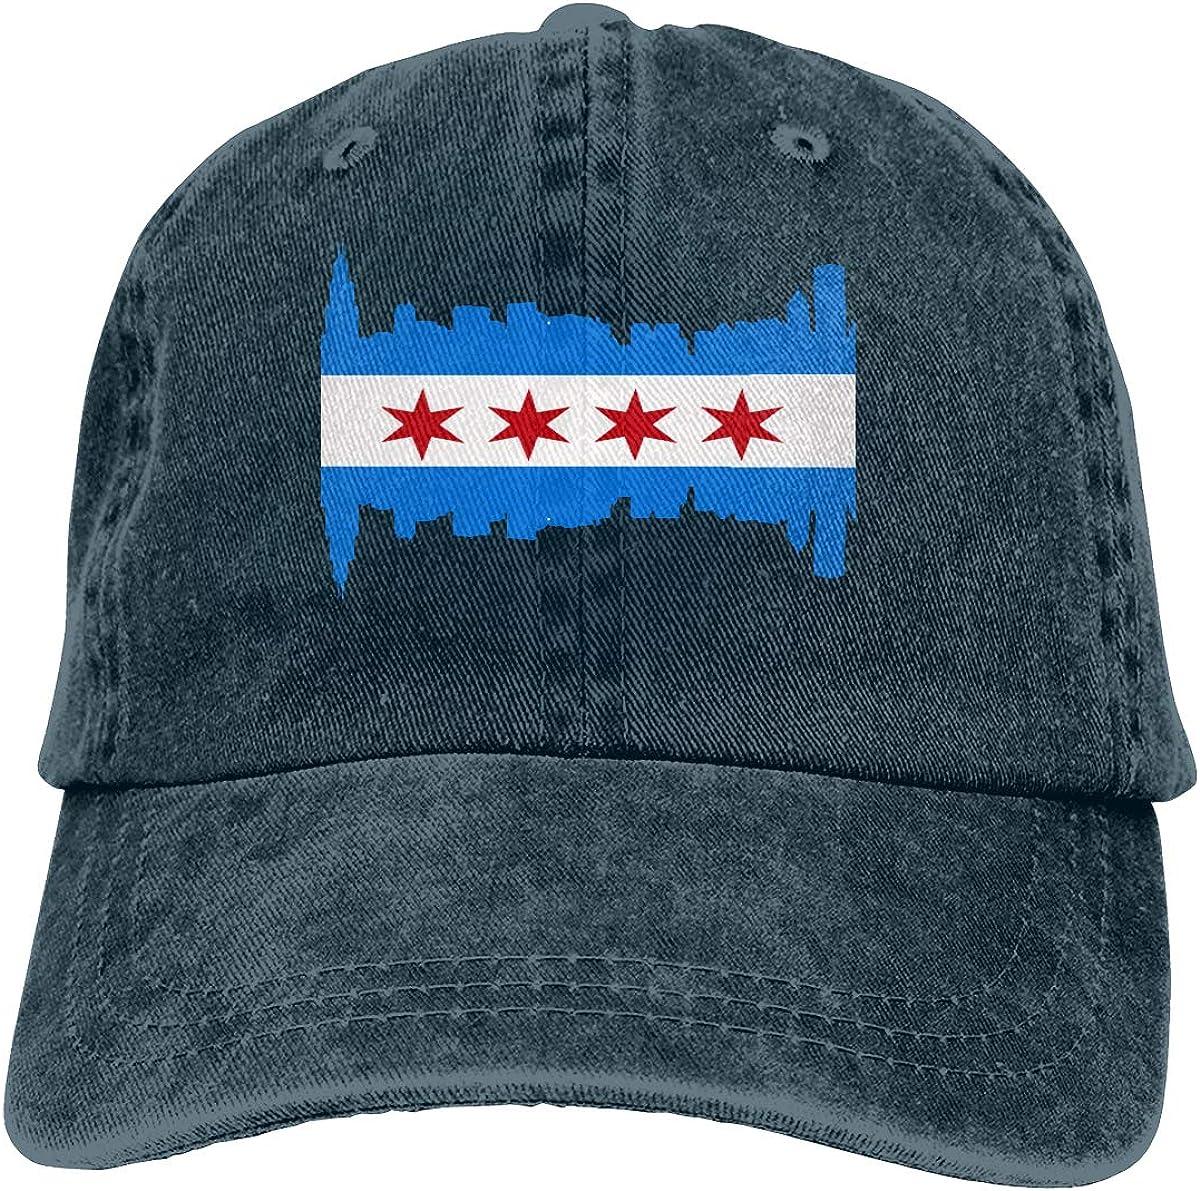 Chicago Flag Denim Hat Adjustable Plain Cap Baseball Caps